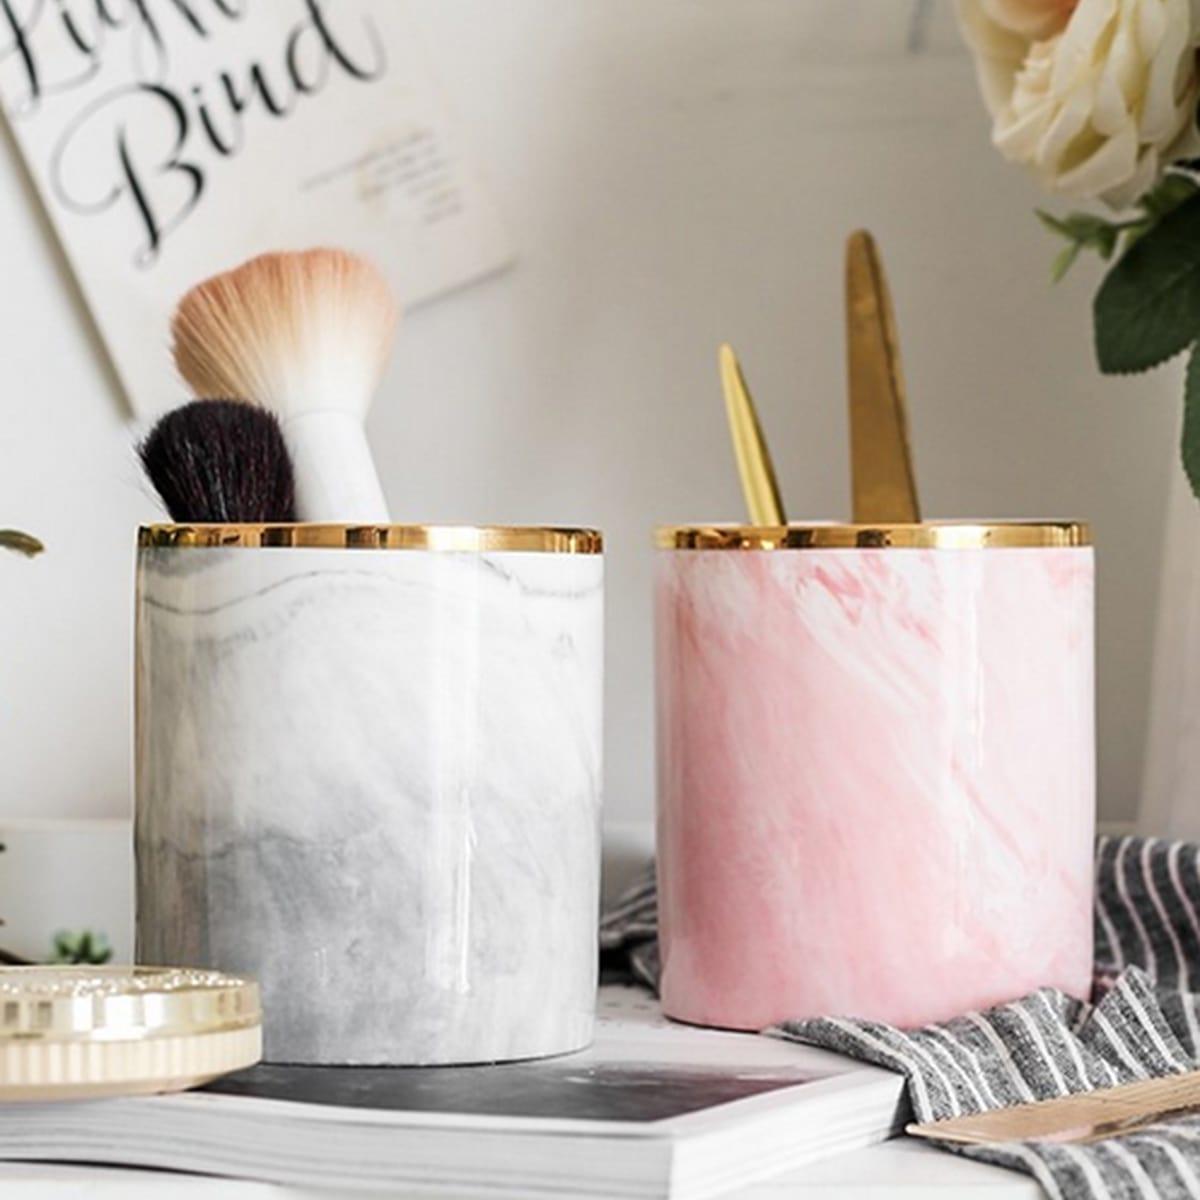 Marmor Muster Makeup Brush Aufbewahrungsbox 1pc